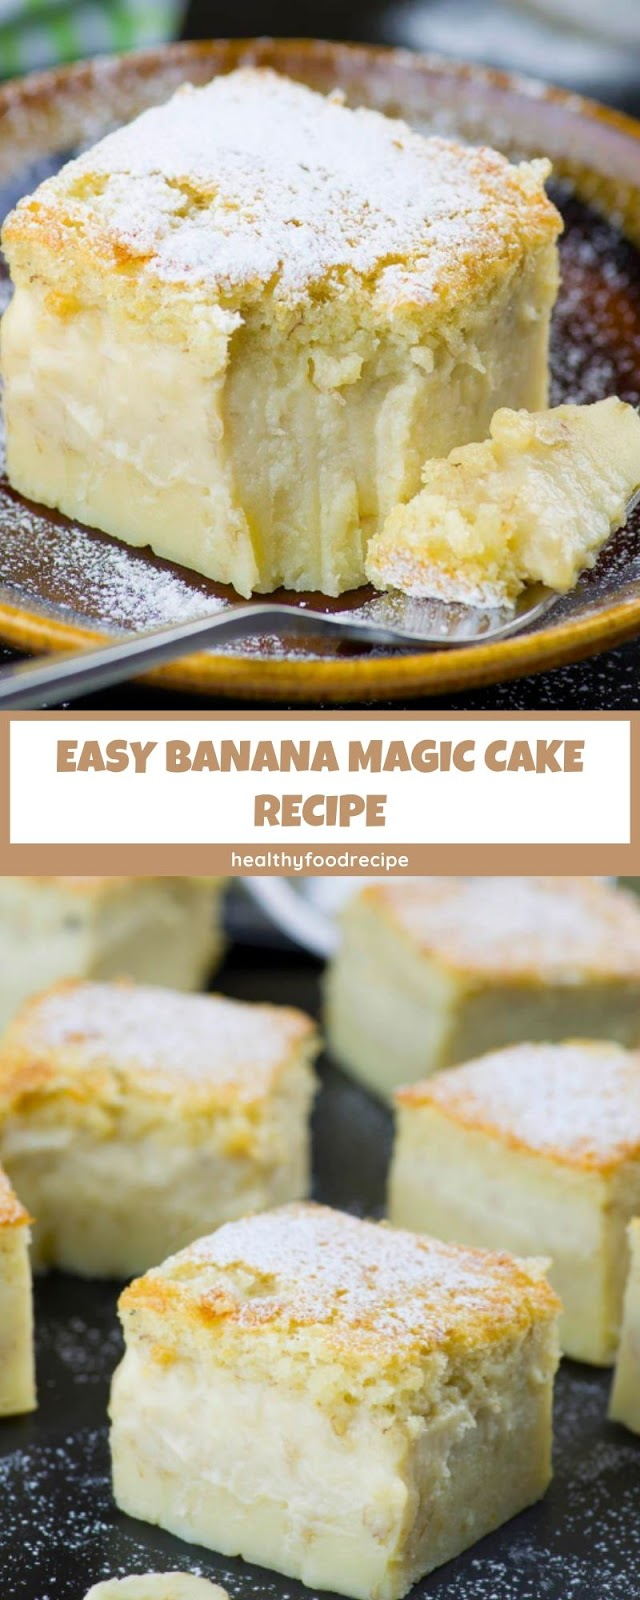 EASY BANANA MAGIC CAKE RECIPE